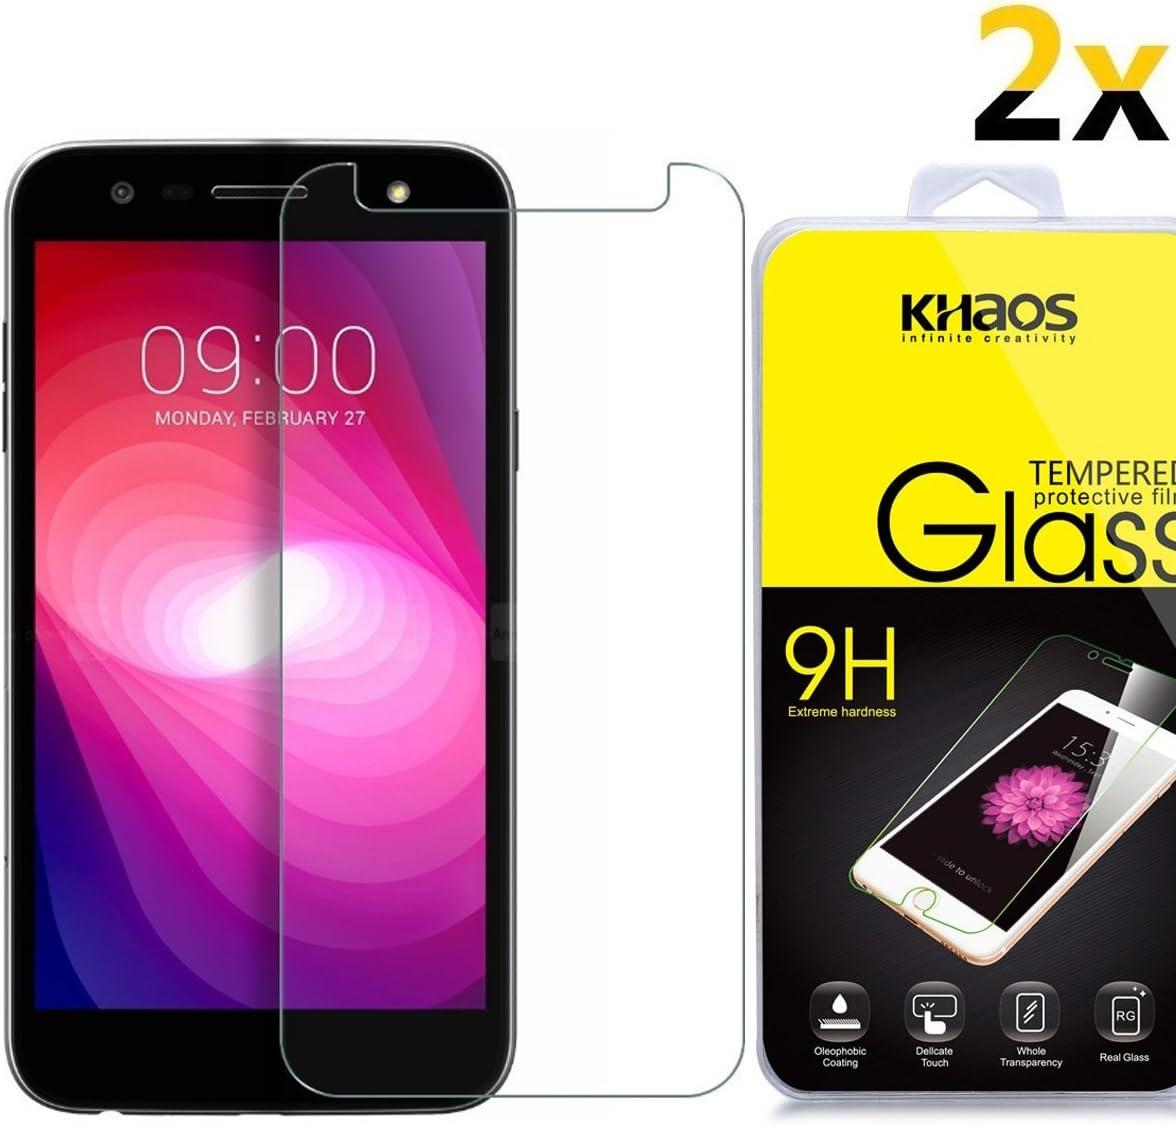 Paquete de 2 unidades: Khaos ❇ – CP11 – LG, LG POWER 2: nintendo ...